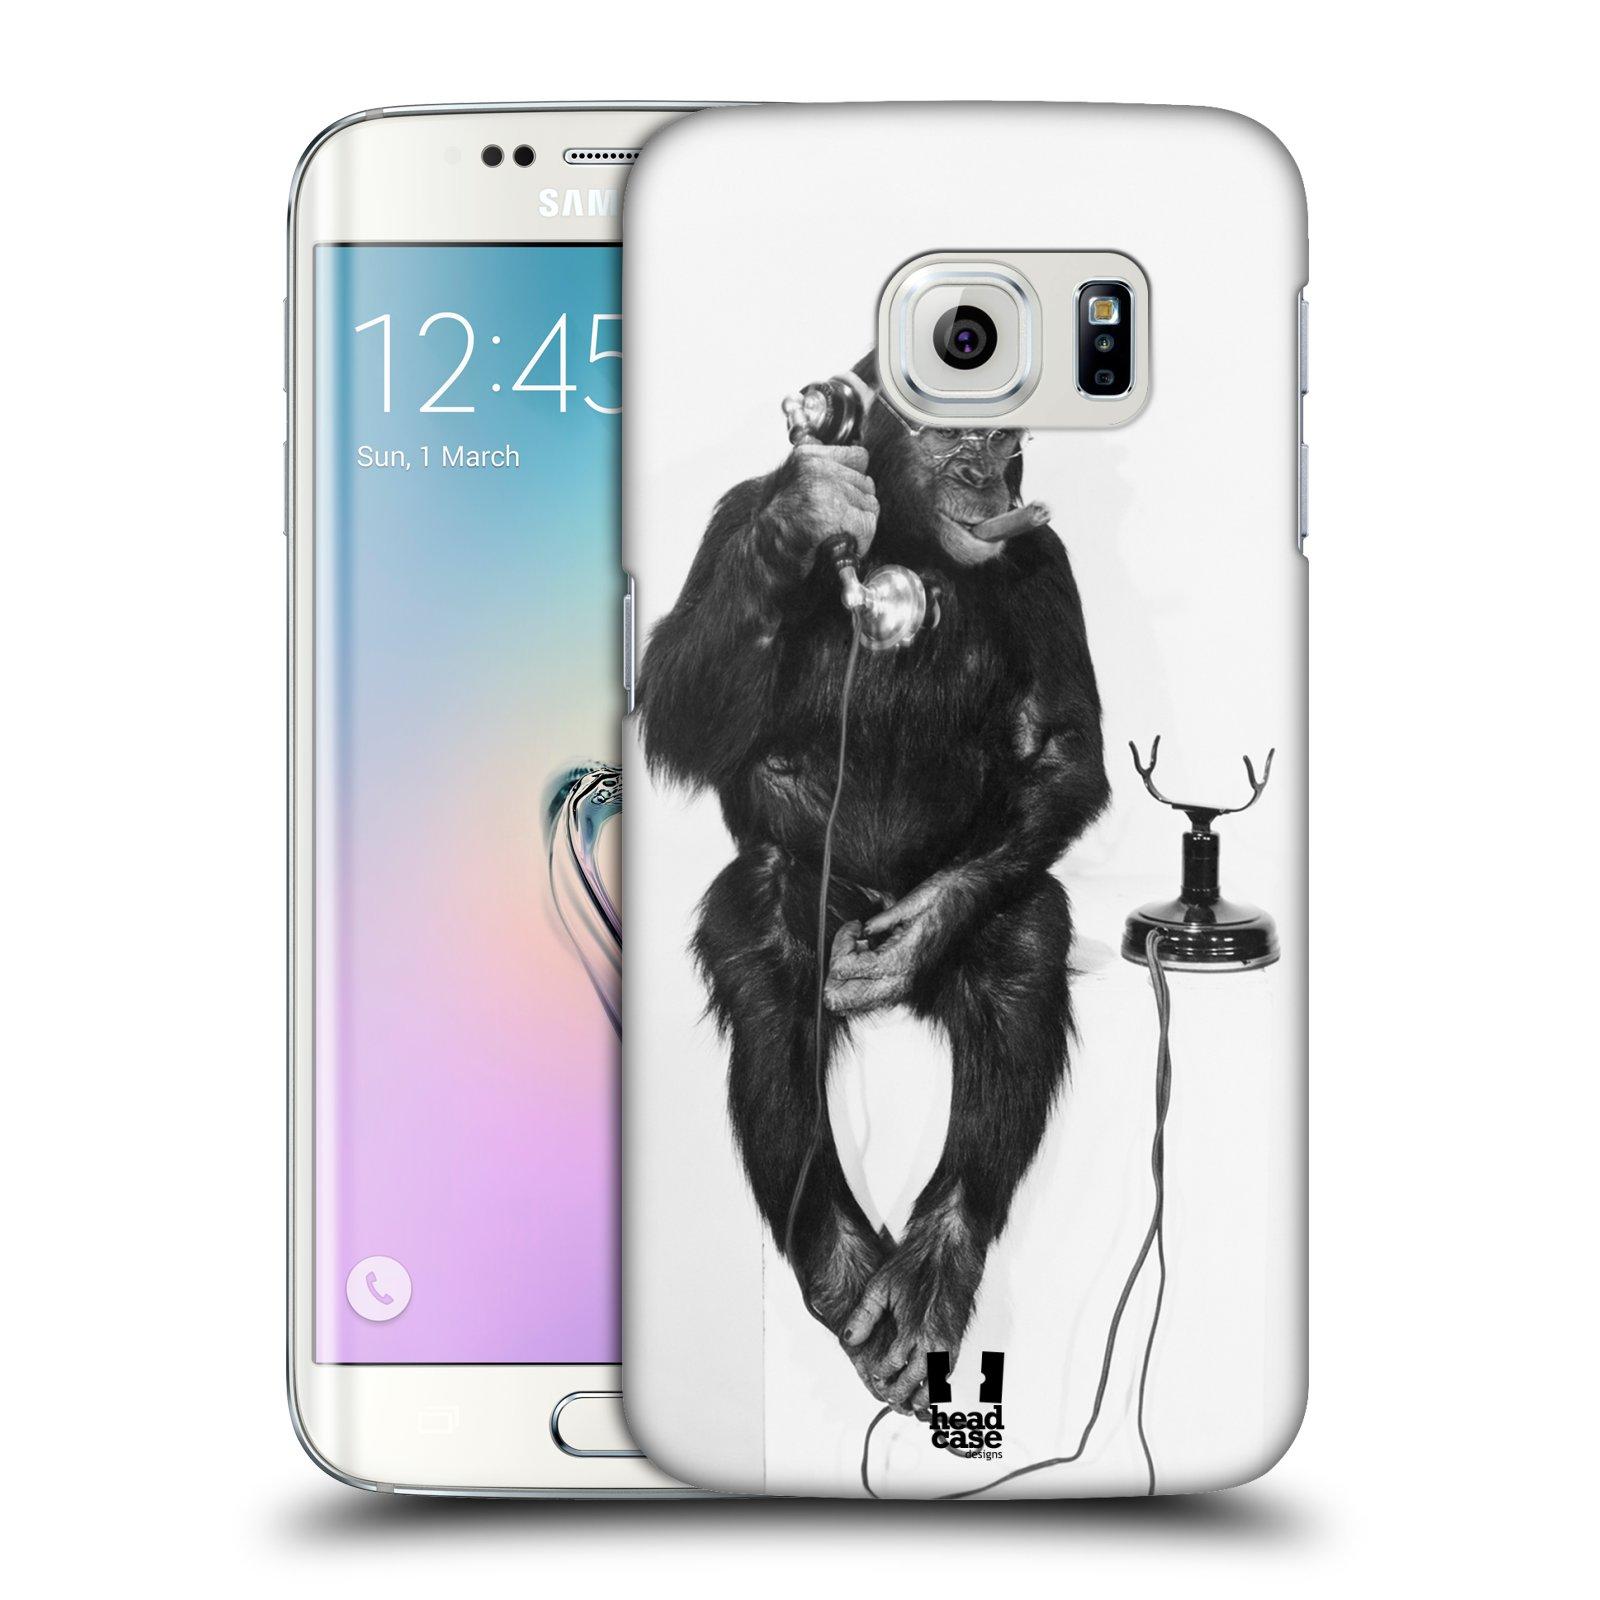 HEAD CASE plastový obal na mobil SAMSUNG Galaxy S6 EDGE (G9250, G925, G925F) vzor Legrační zvířátka opička se sluchátkem